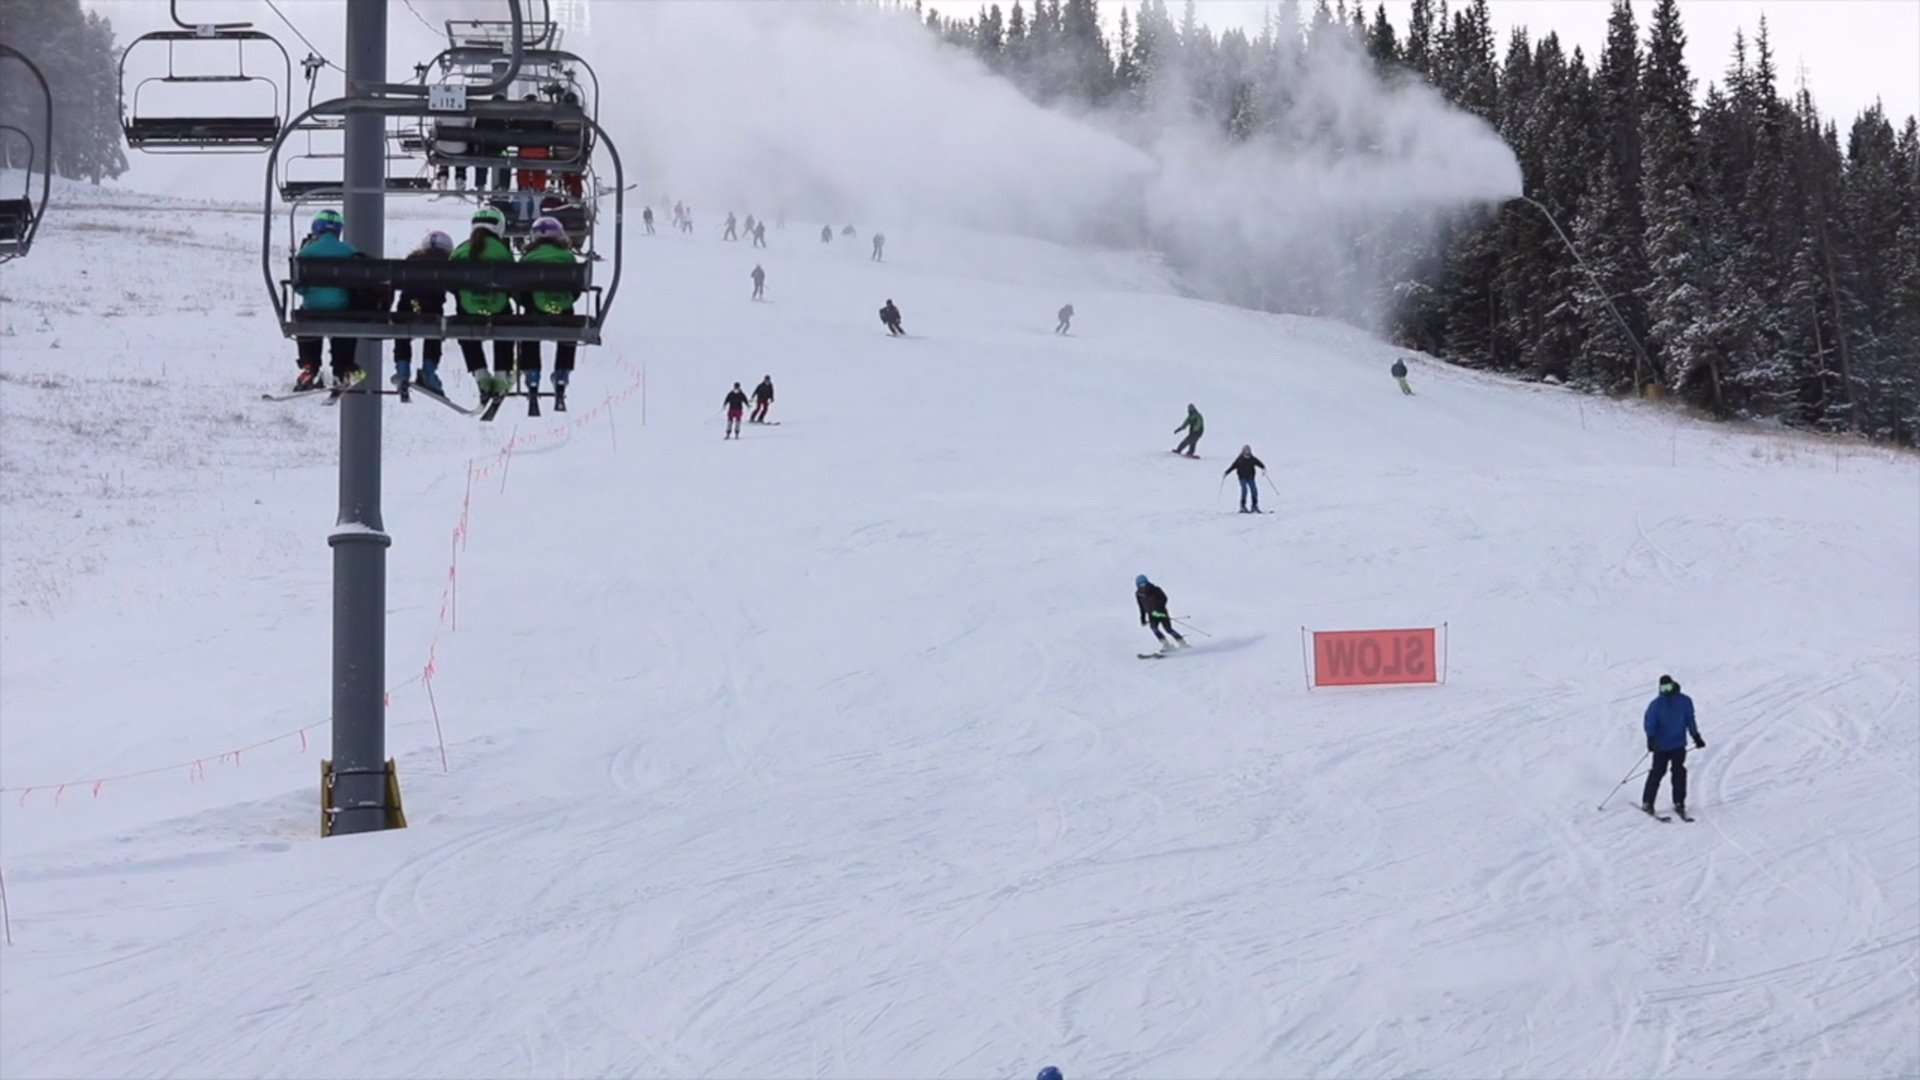 Keystone Ski Resort is seen in this file photo.